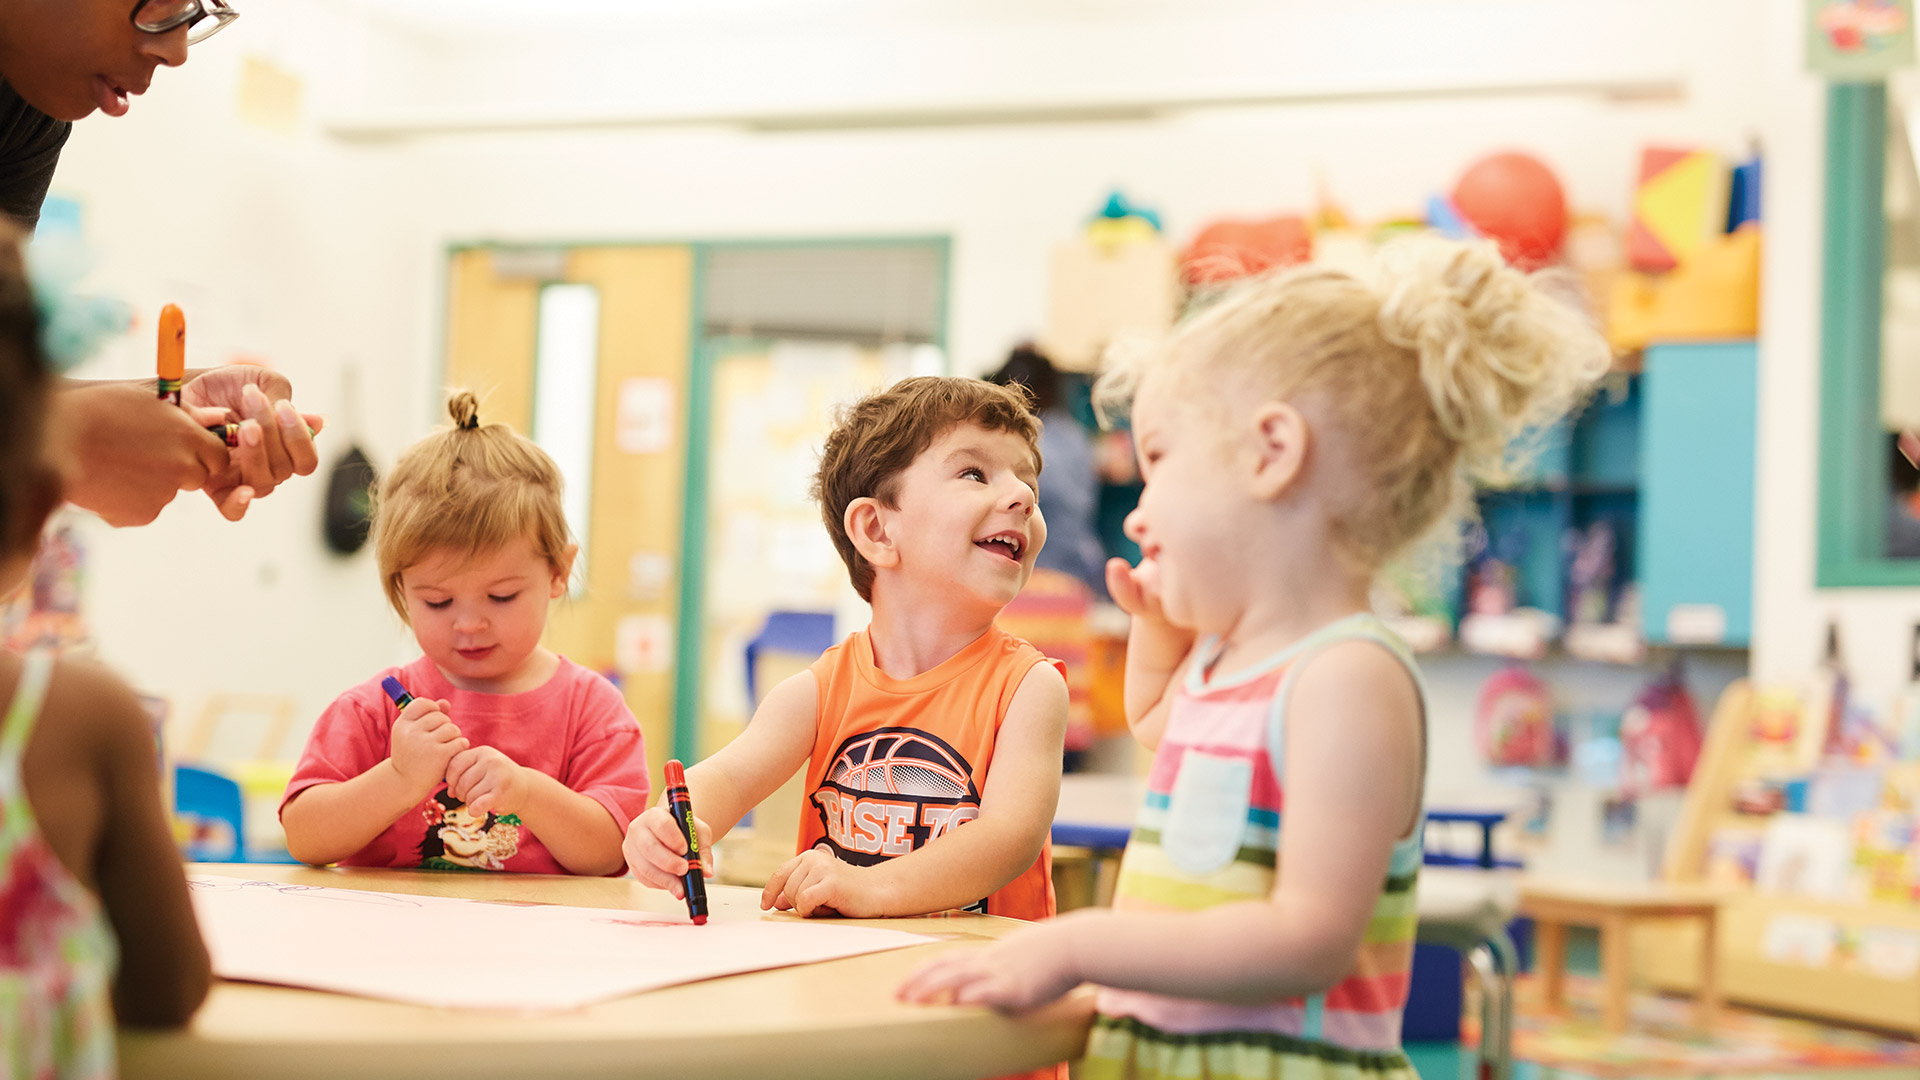 Therapeutic Preschooler Coloring